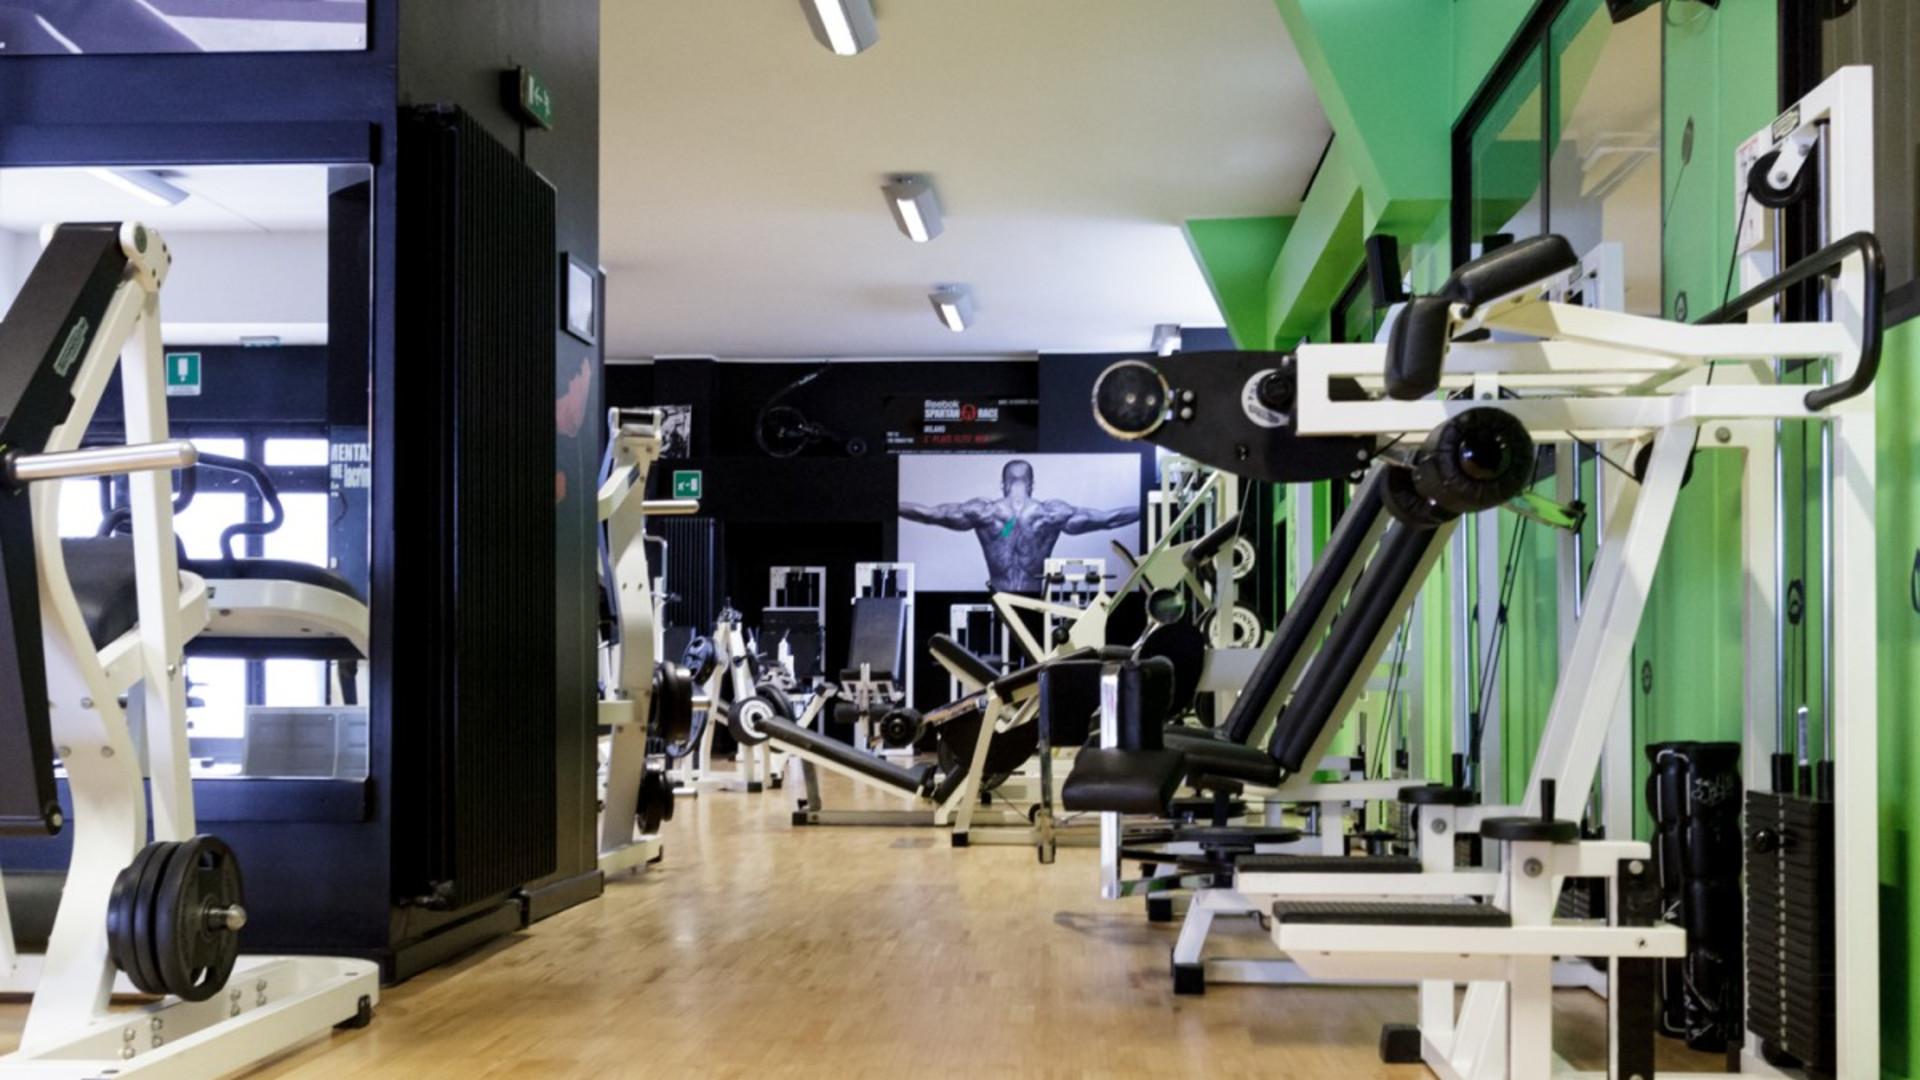 Gym Center orari